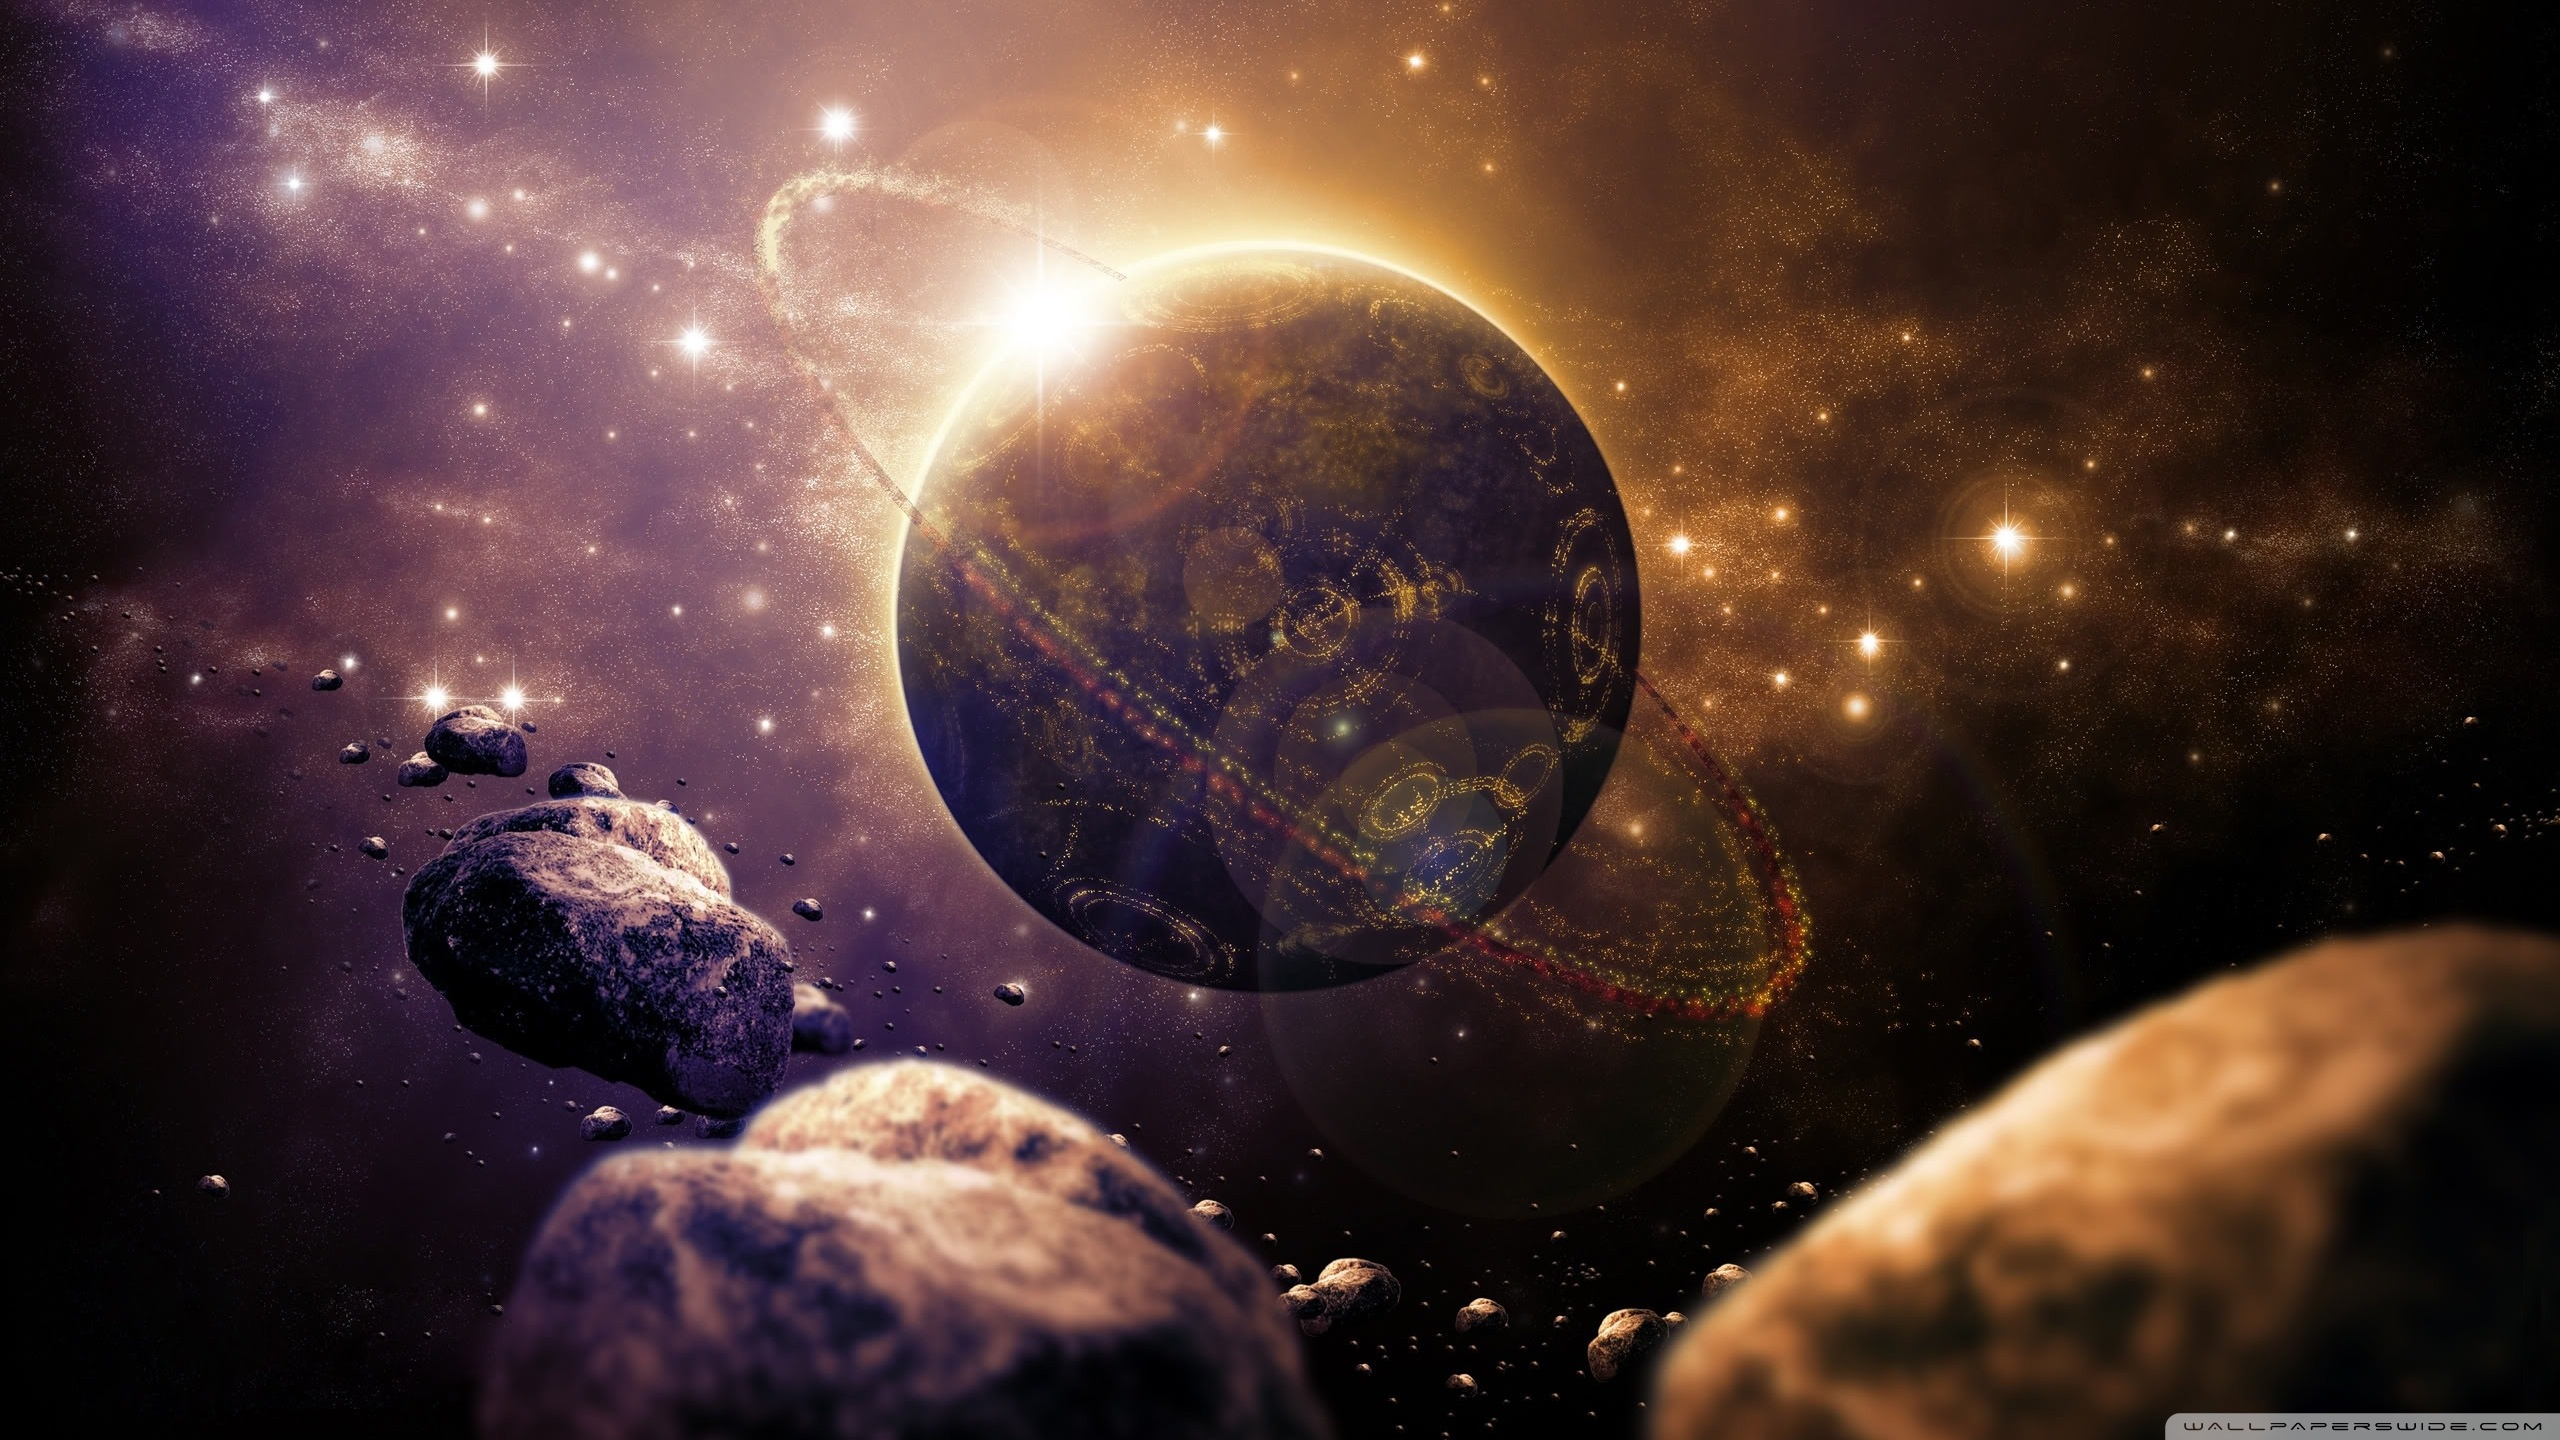 Sci fi planet wallpaper 2560 1440 the jester 39 s corner - Space 2560 x 1440 ...